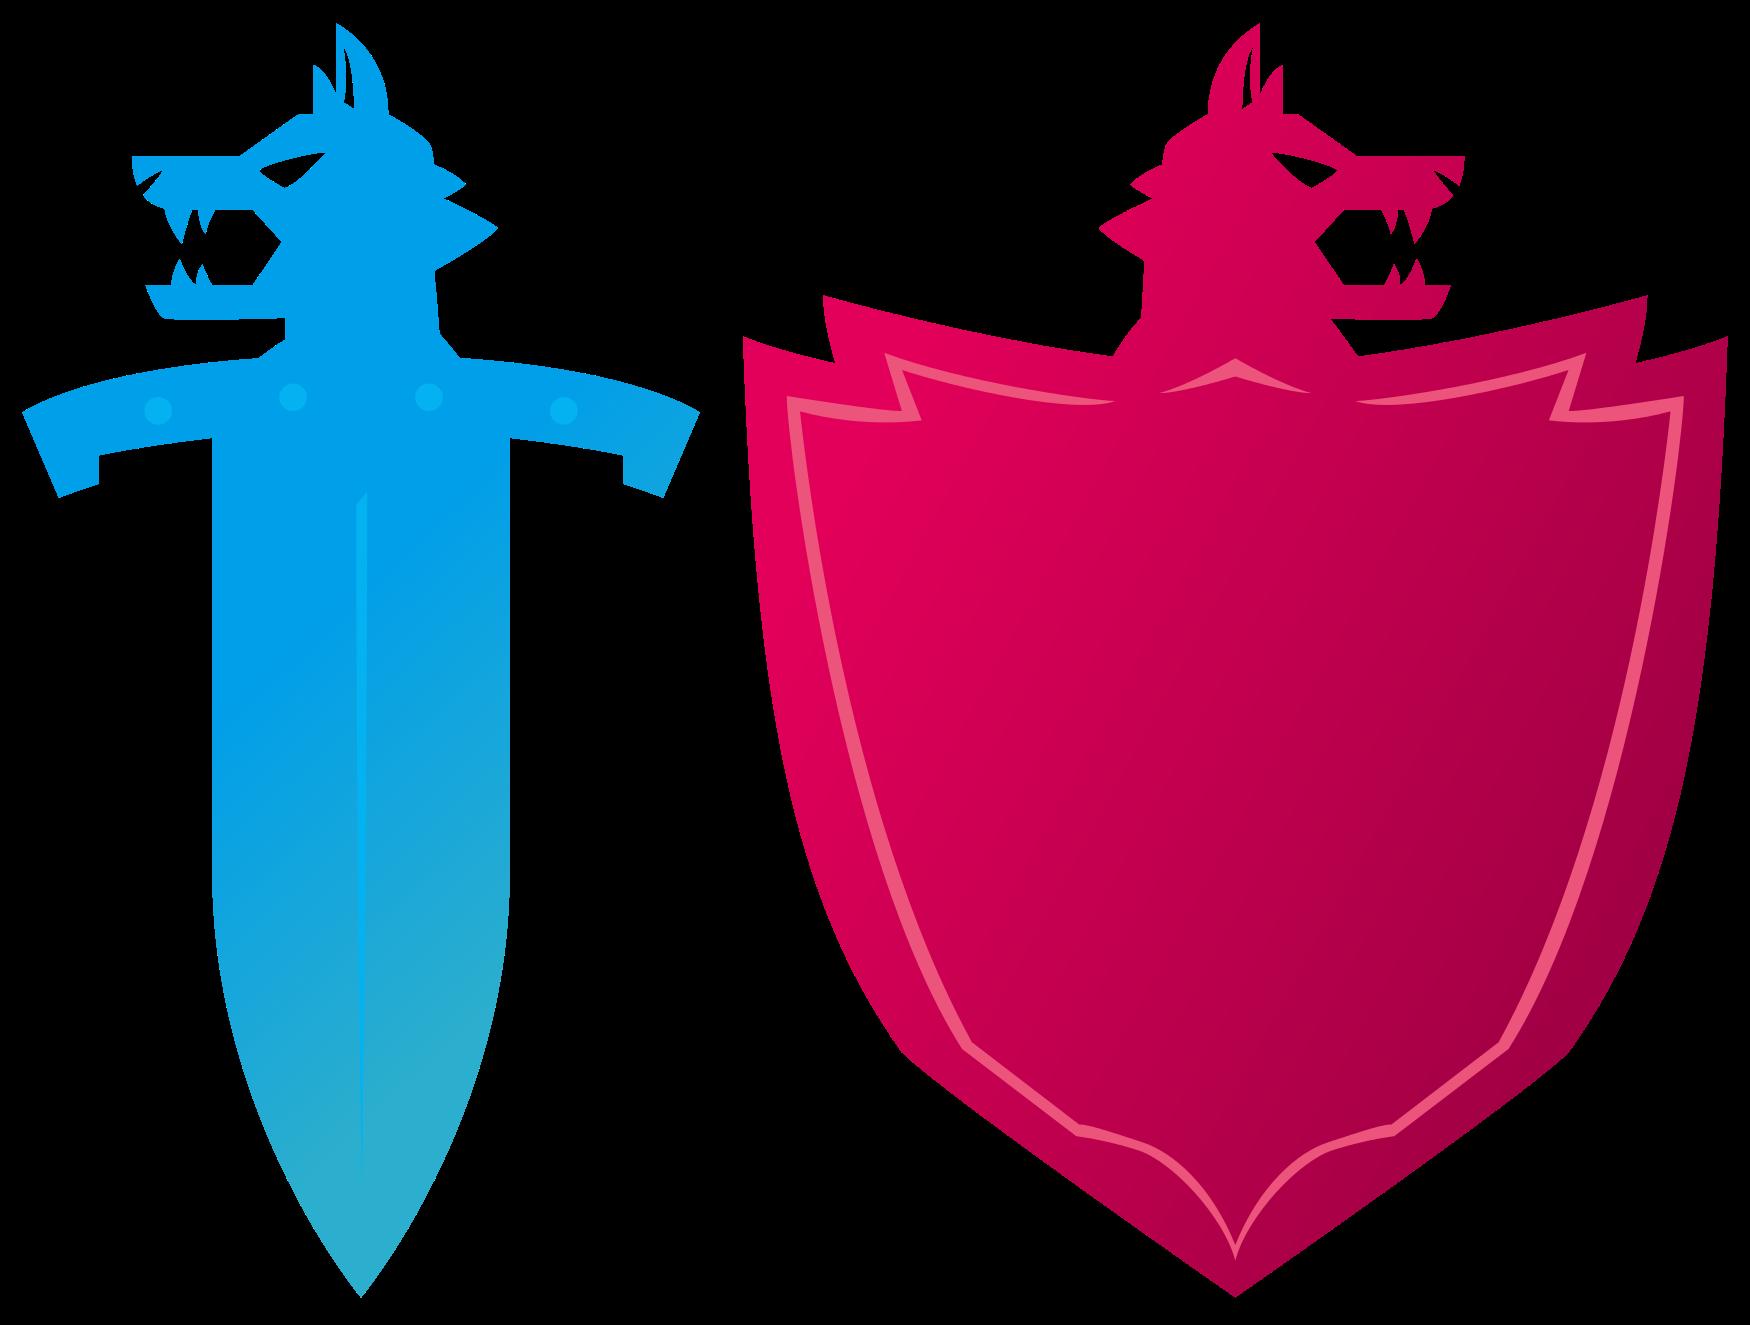 Pokemon Sword And Shield Symbols Recreation By Decatilde On Deviantart